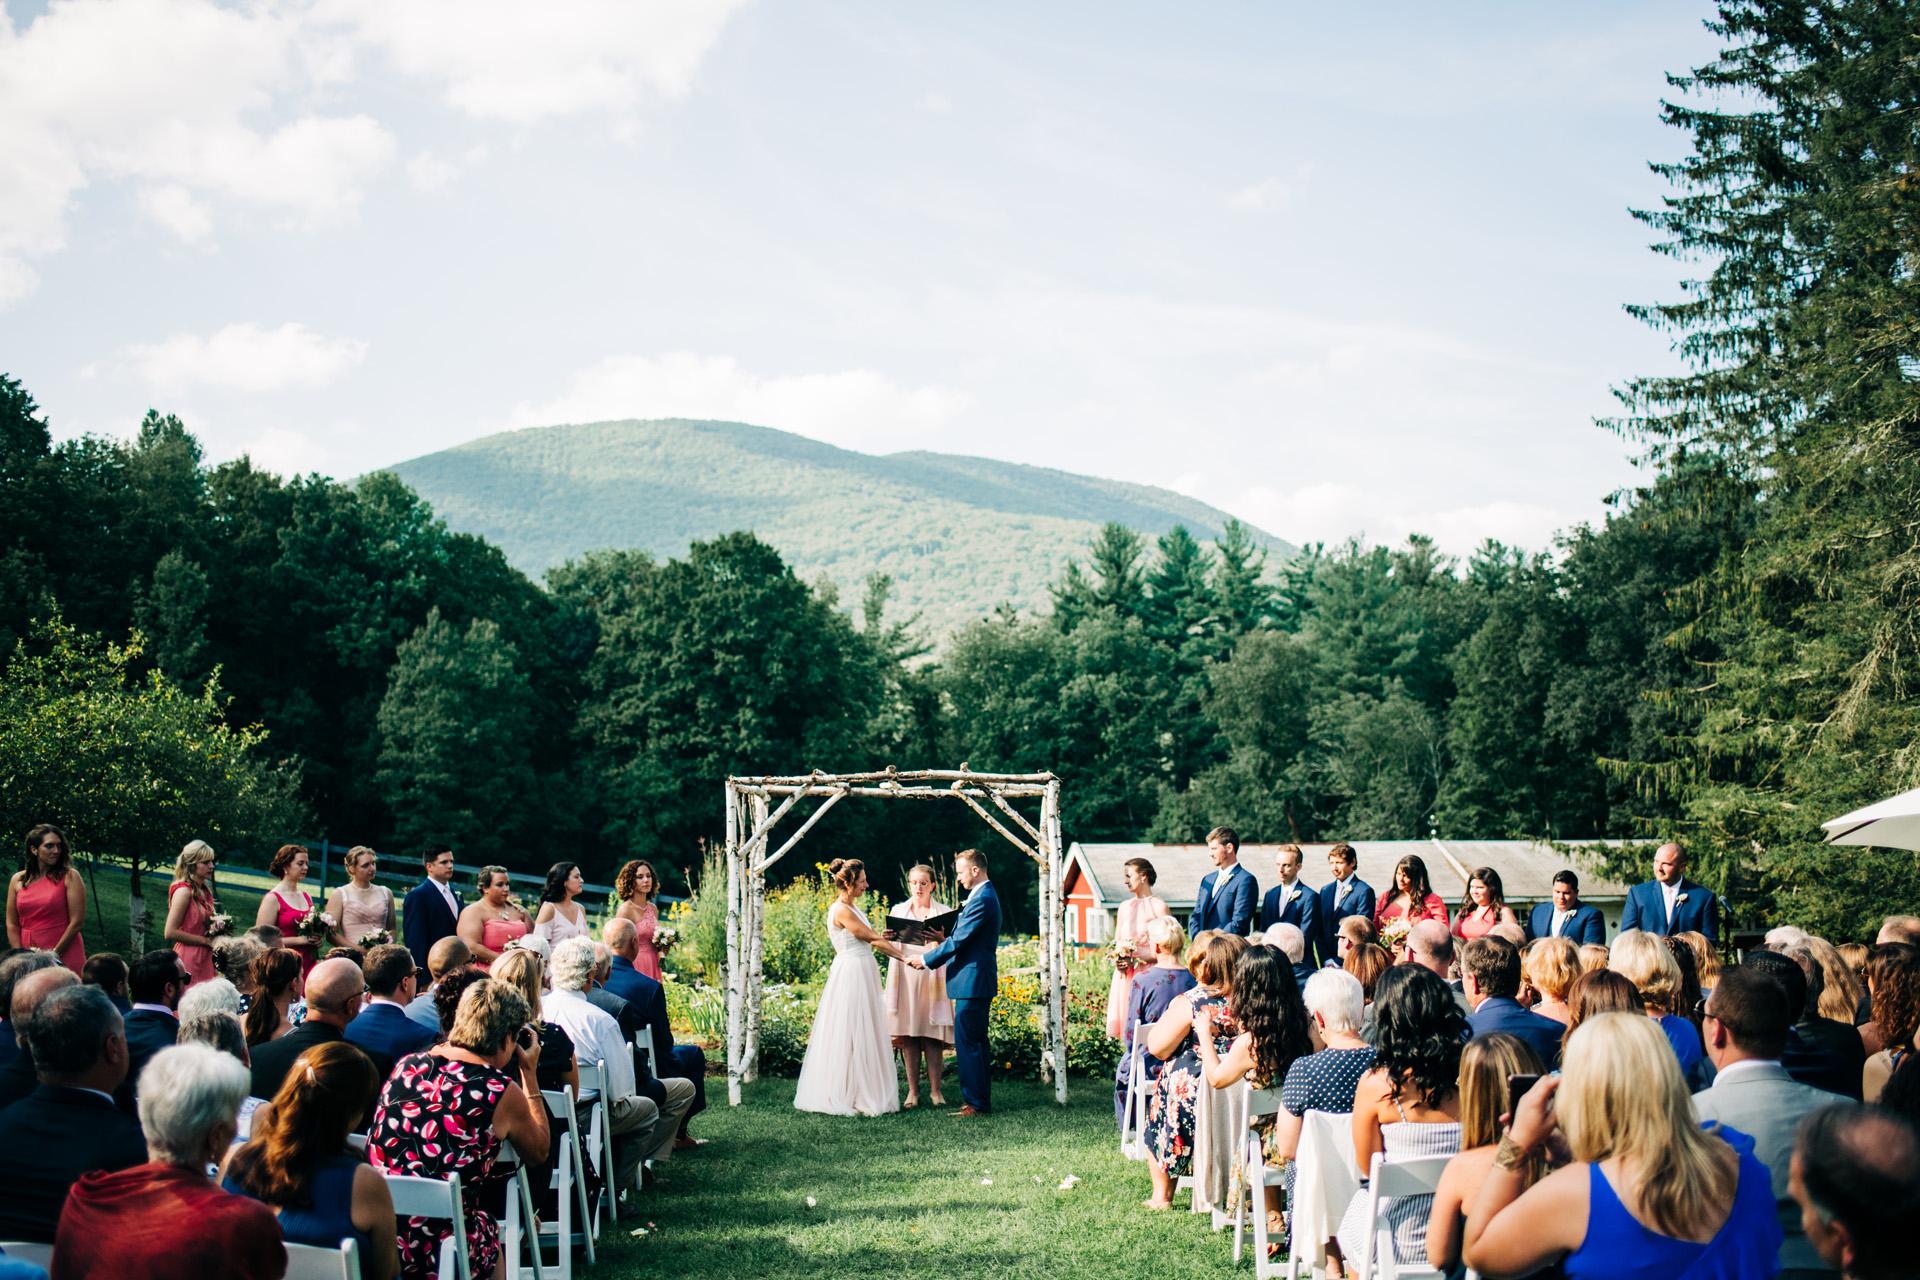 west-mountain-inn-wedding-photographer-34